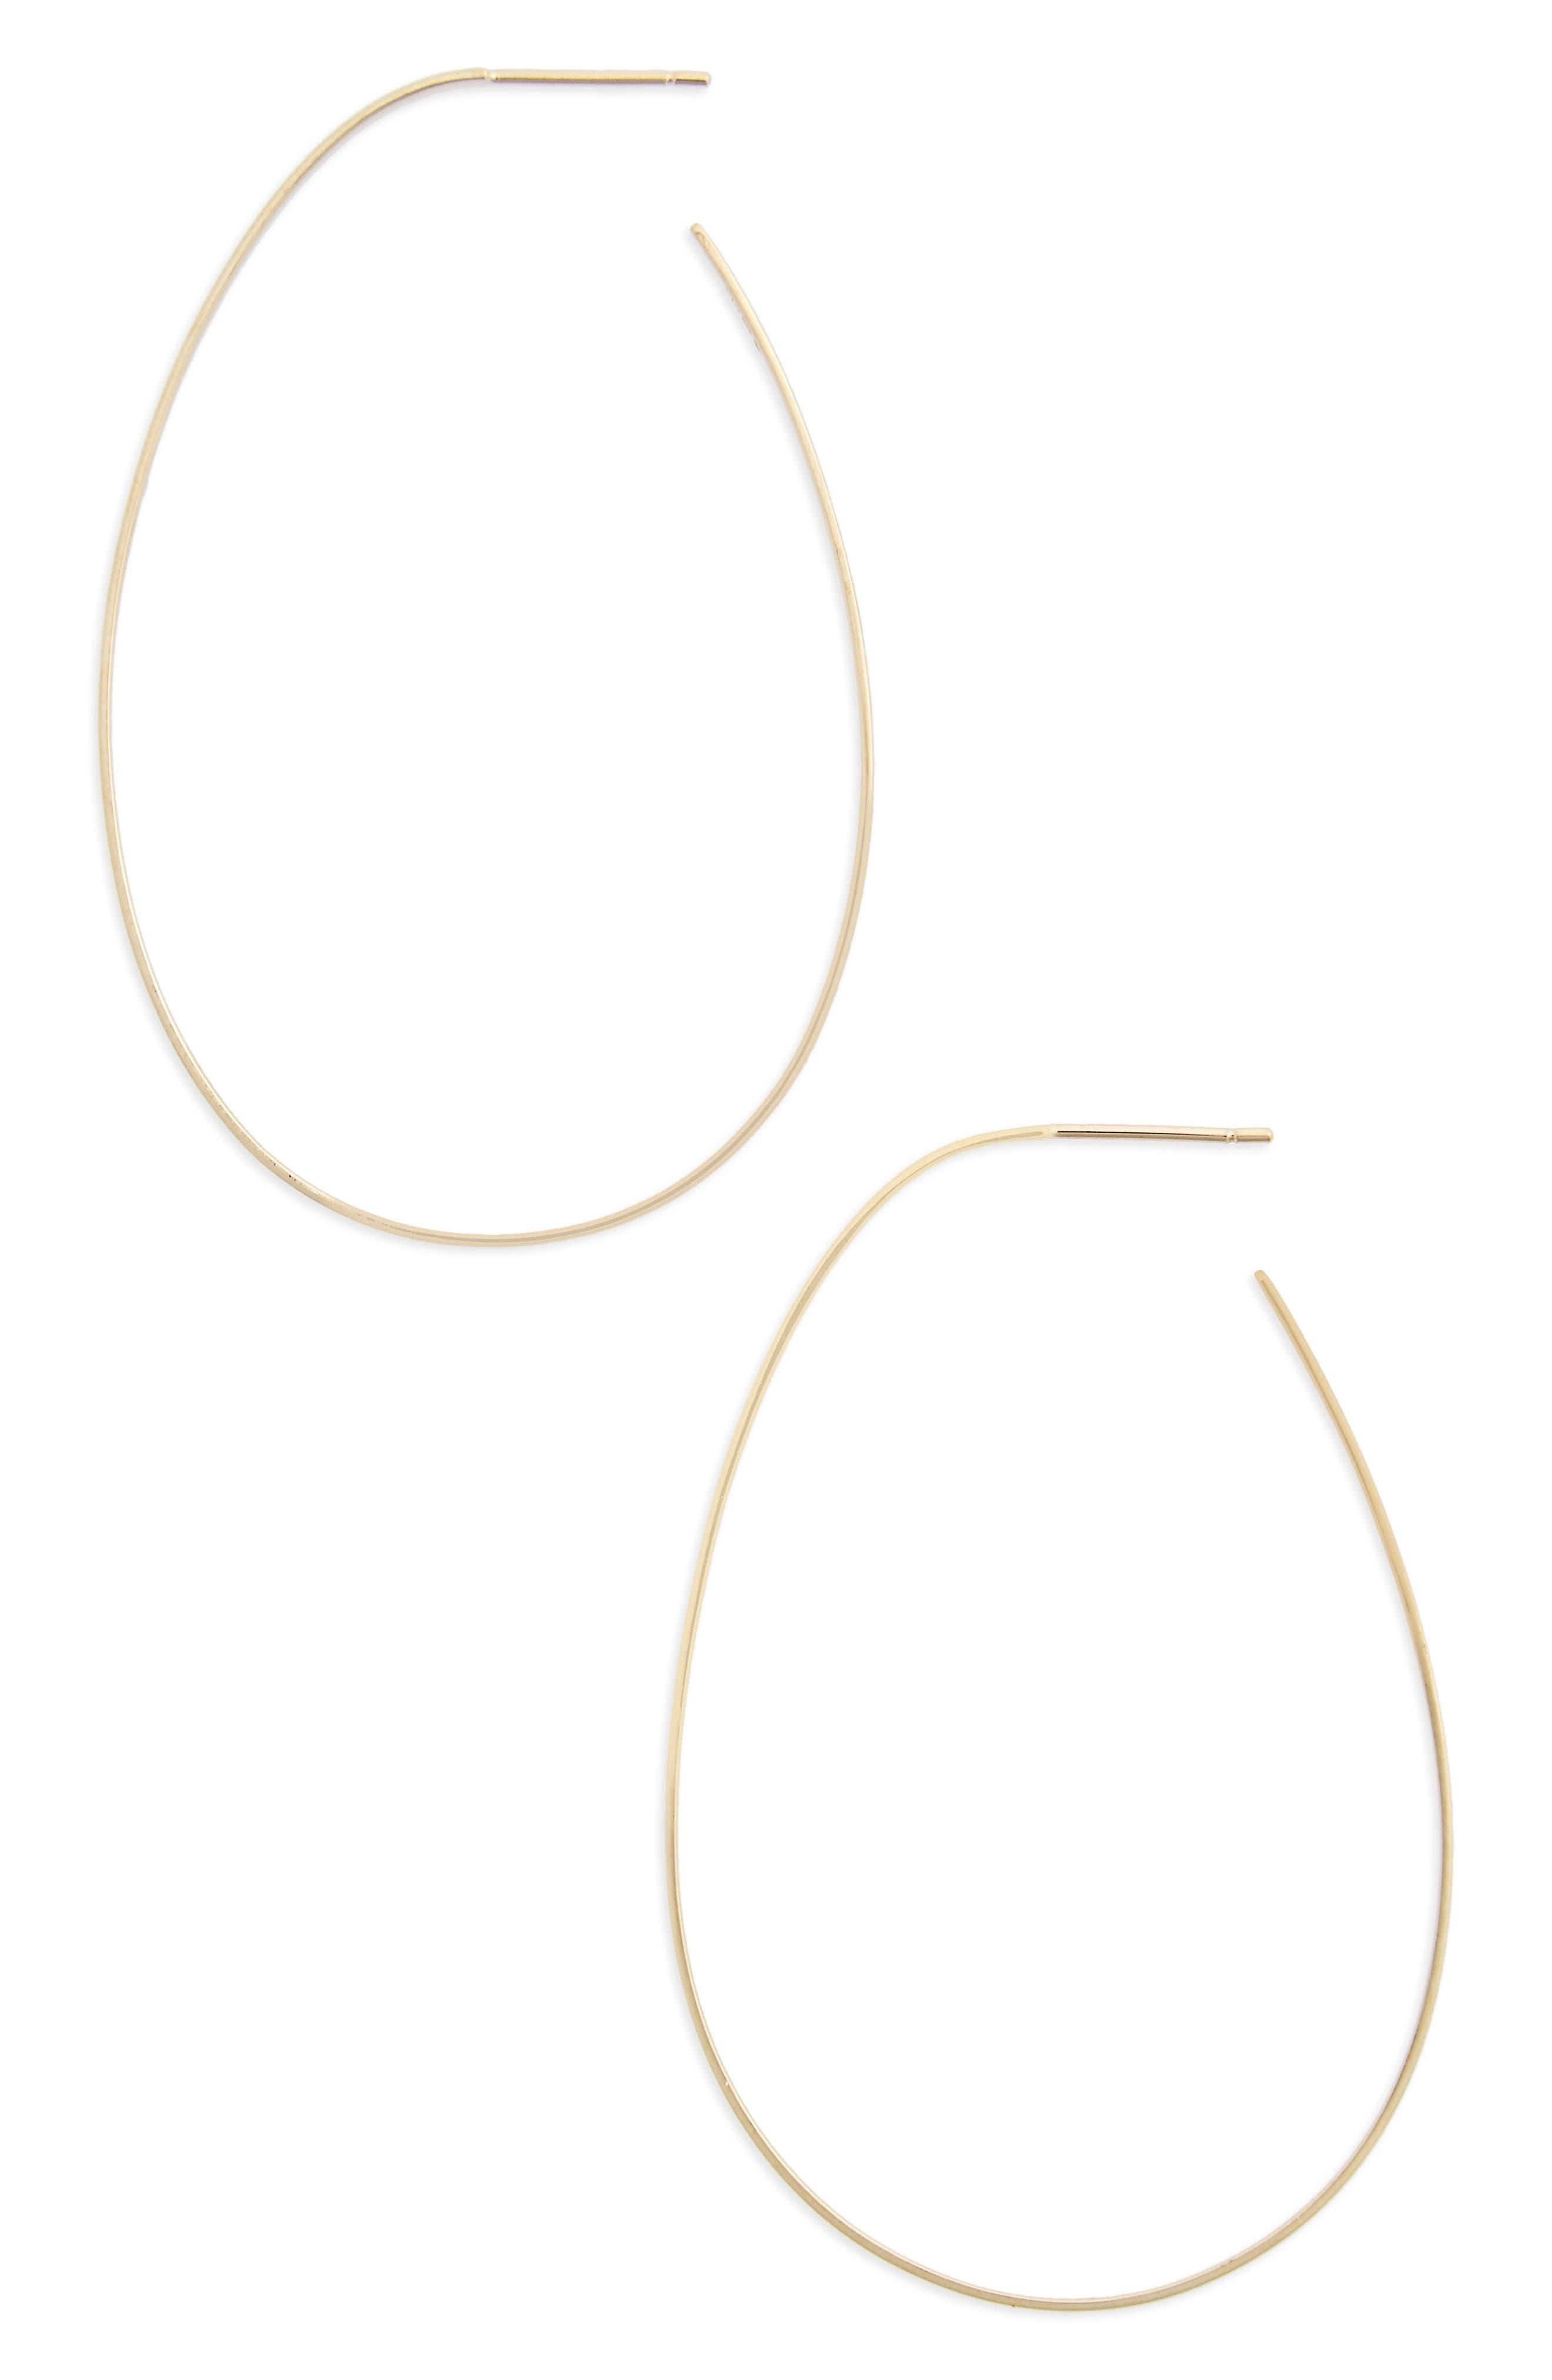 Bond Teardrop Hoop Earrings,                         Main,                         color, Yellow Gold